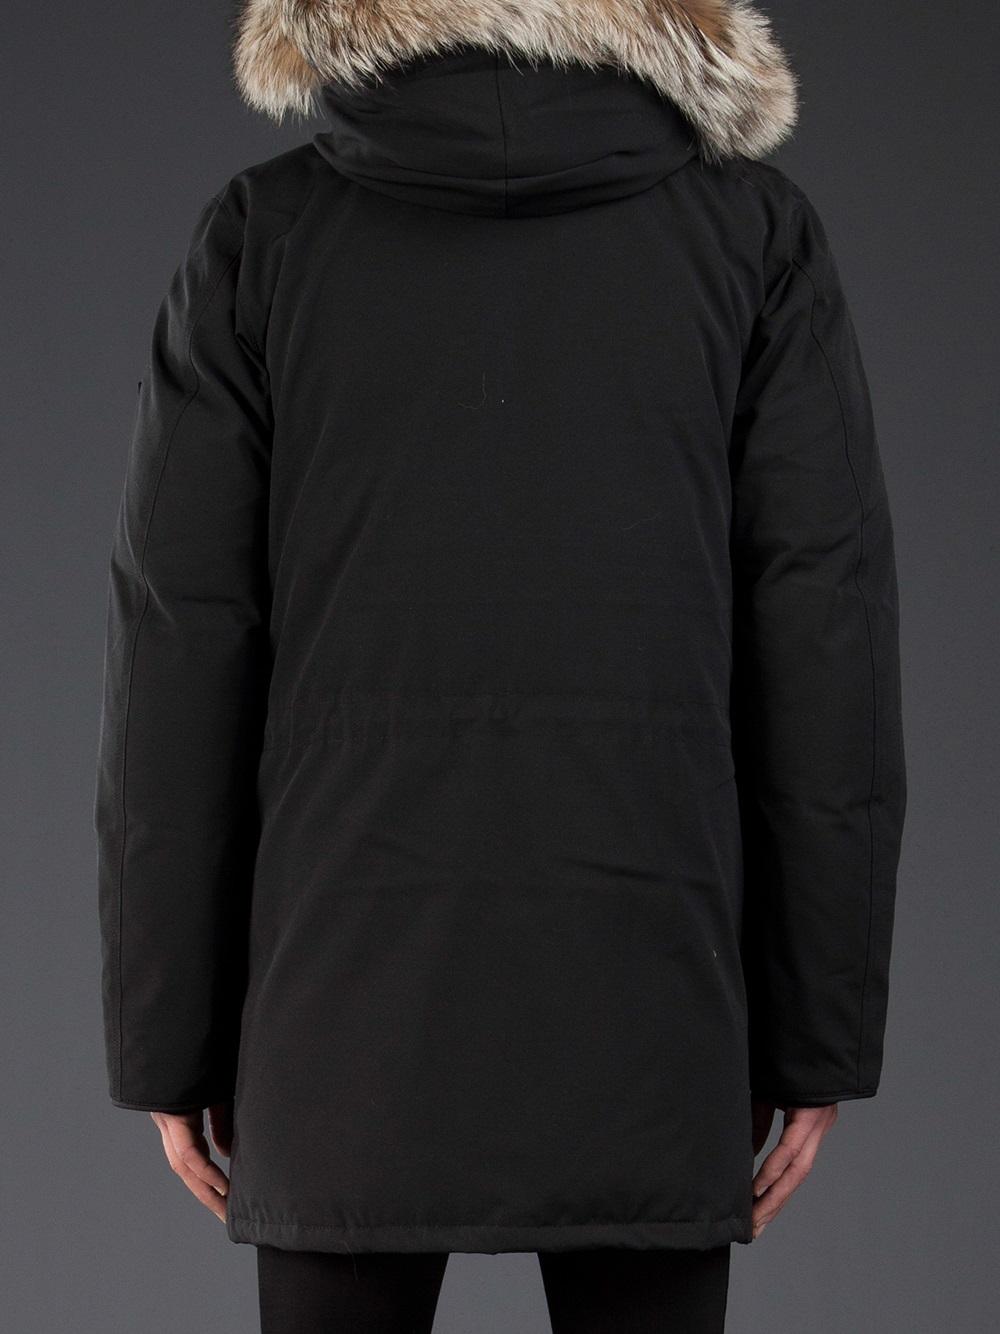 Lyst Canada Goose Citadel Parka In Black For Men